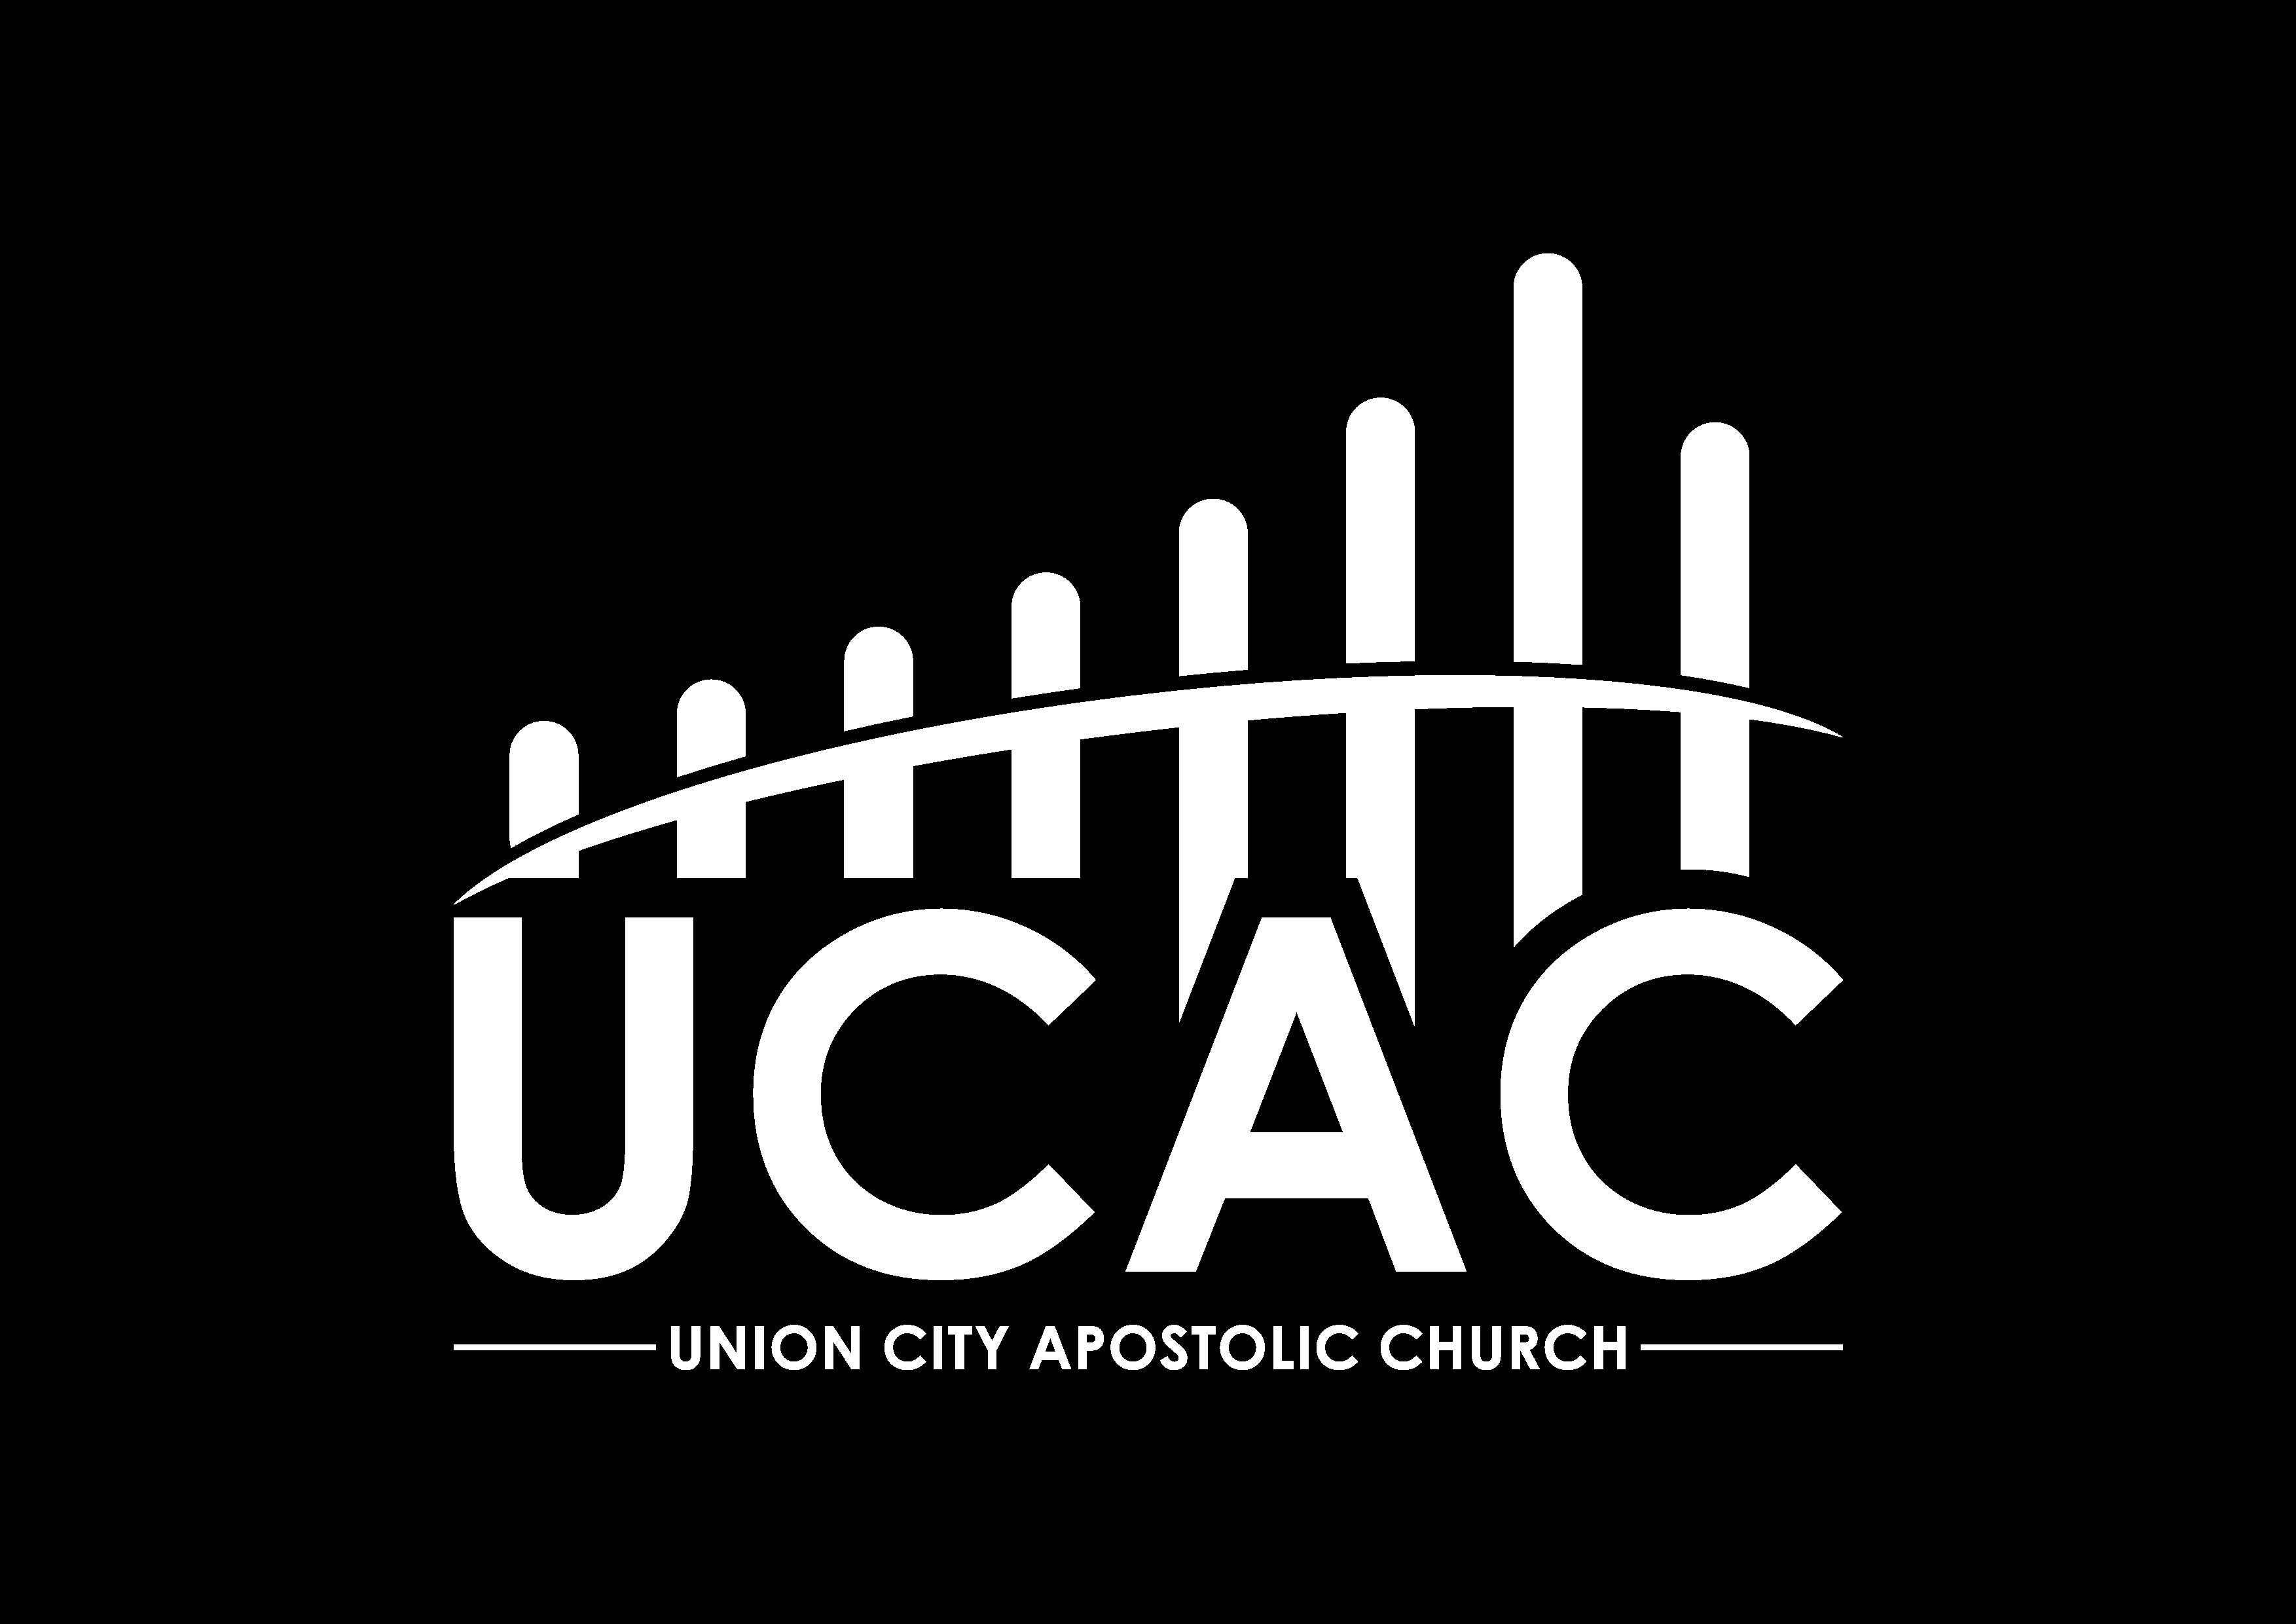 Union City Apostolic Church Logo